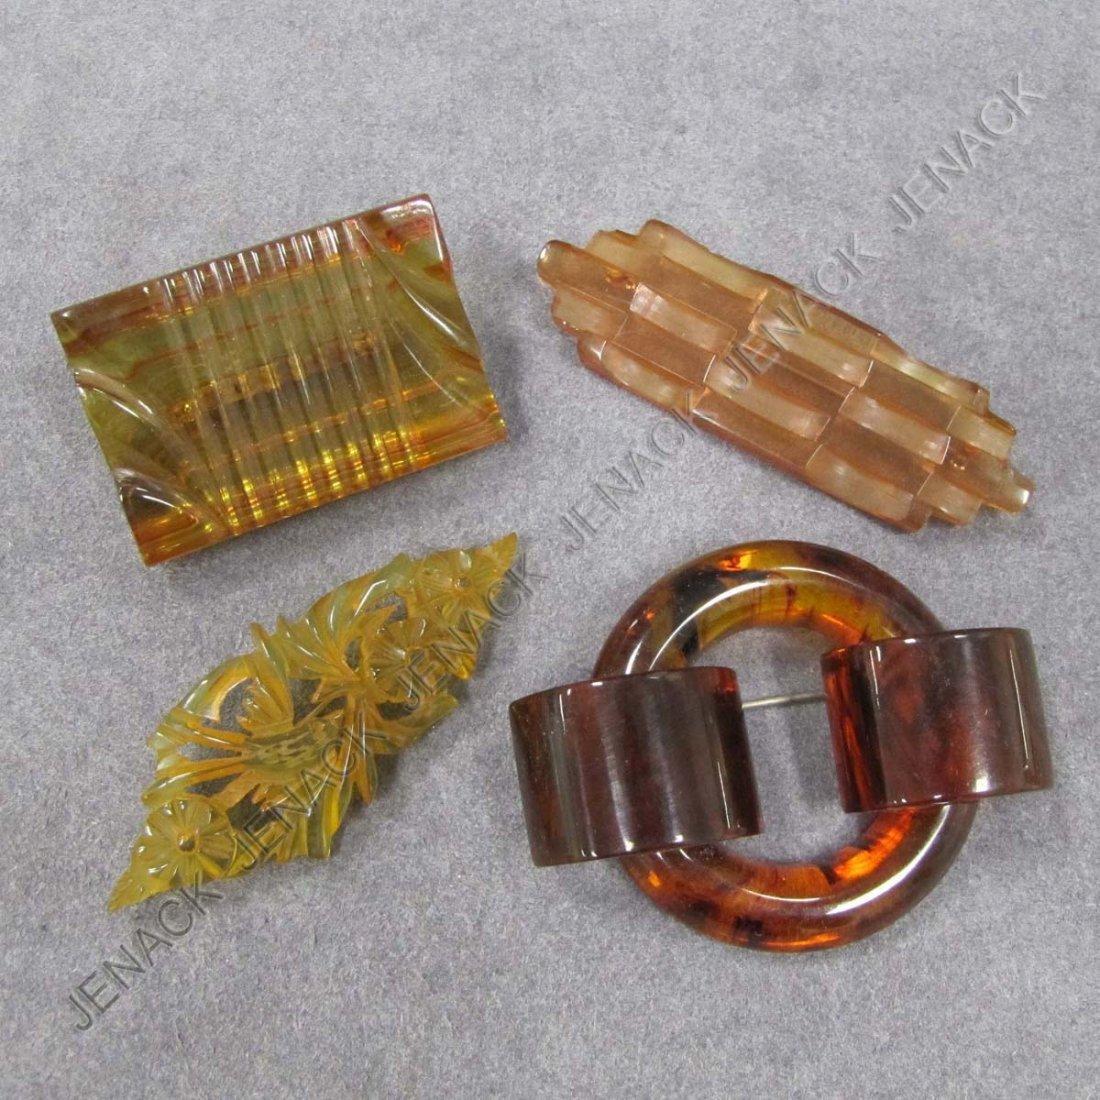 16: LOT (4) VINTAGE TRANSPARENT BAKELITE PINS/BROOCHES